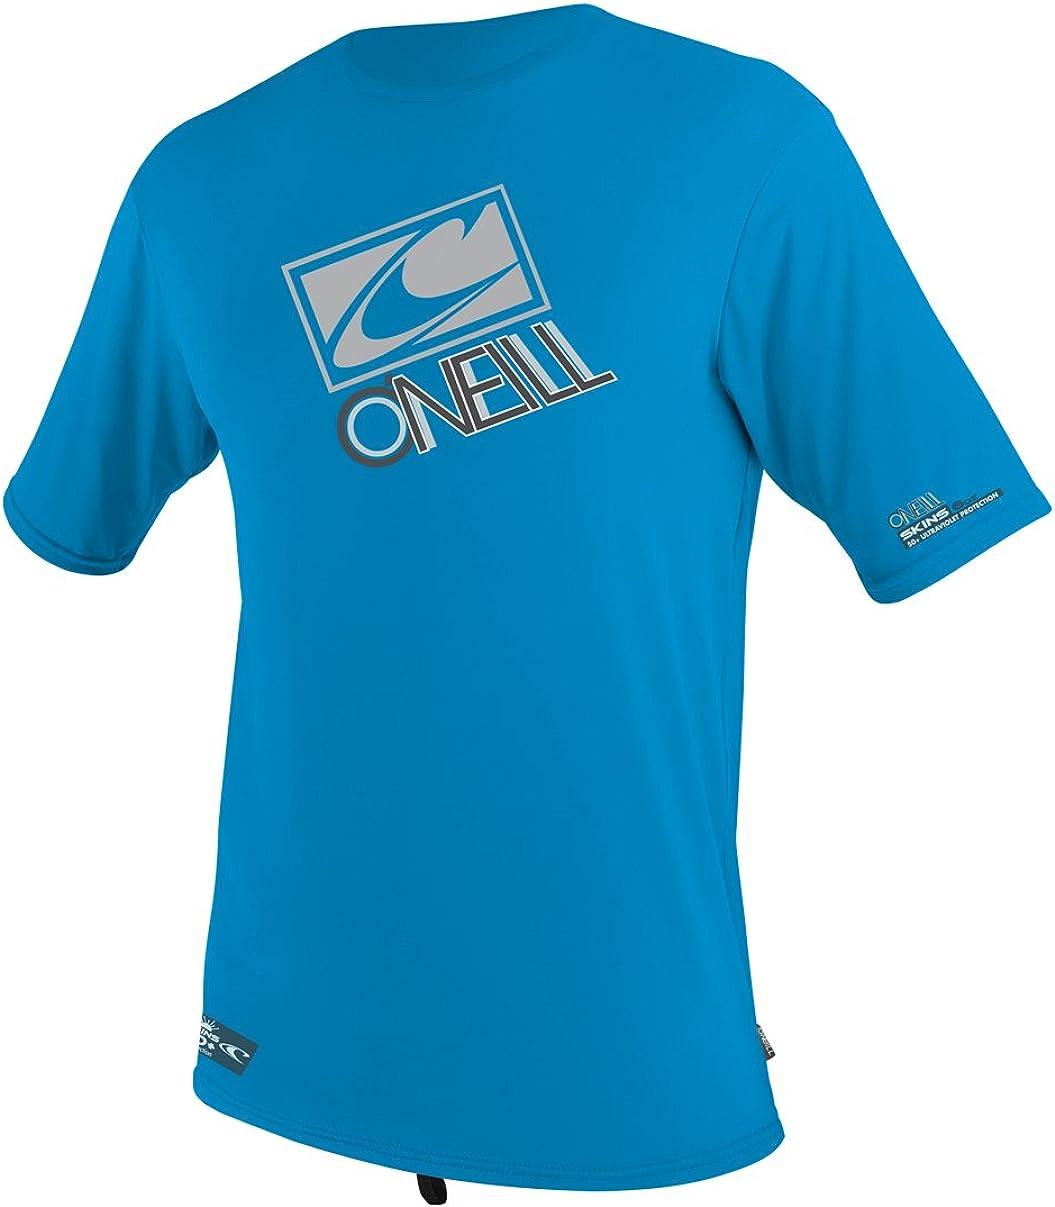 O'Neill Wetsuits Skins Short Sleeve Rash Tee